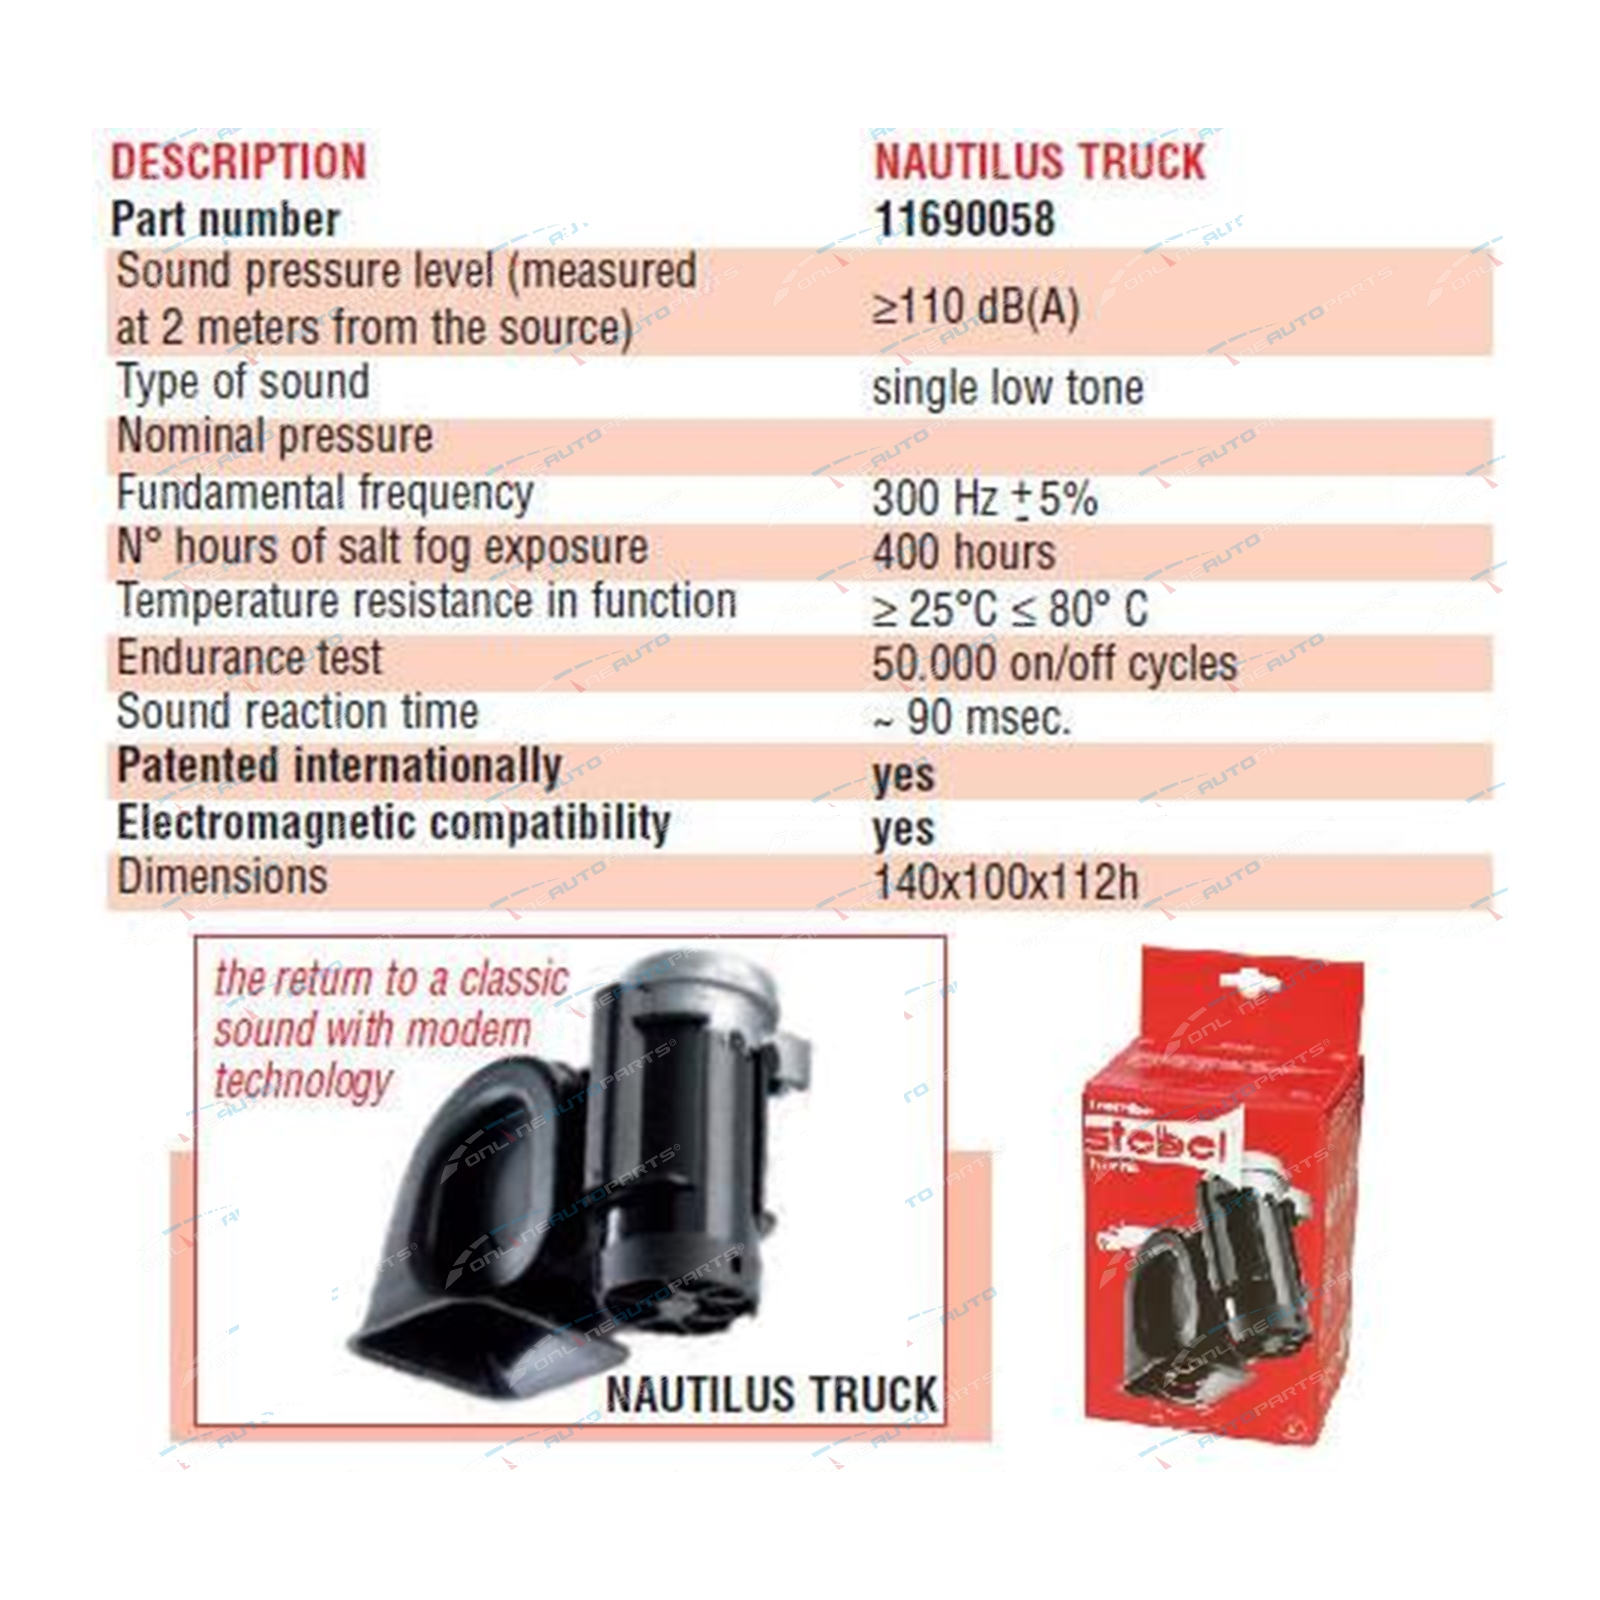 stebel nautilus compact truck car air horn 12volt 300hz deep 110d. Black Bedroom Furniture Sets. Home Design Ideas